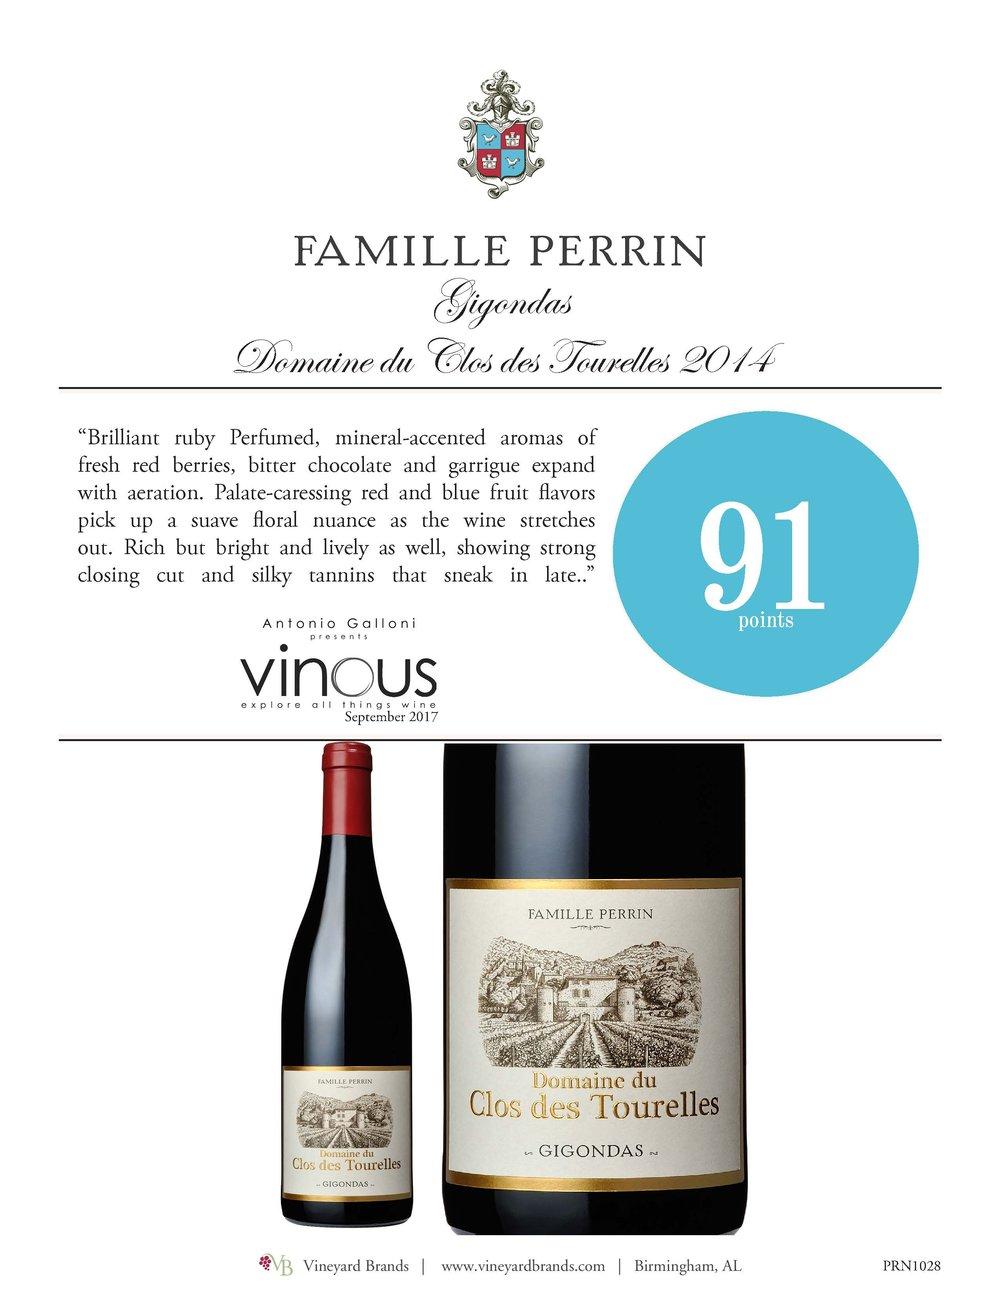 Famille Perrin Gigondas Domaine du Clos des Tourelles 2014.jpg